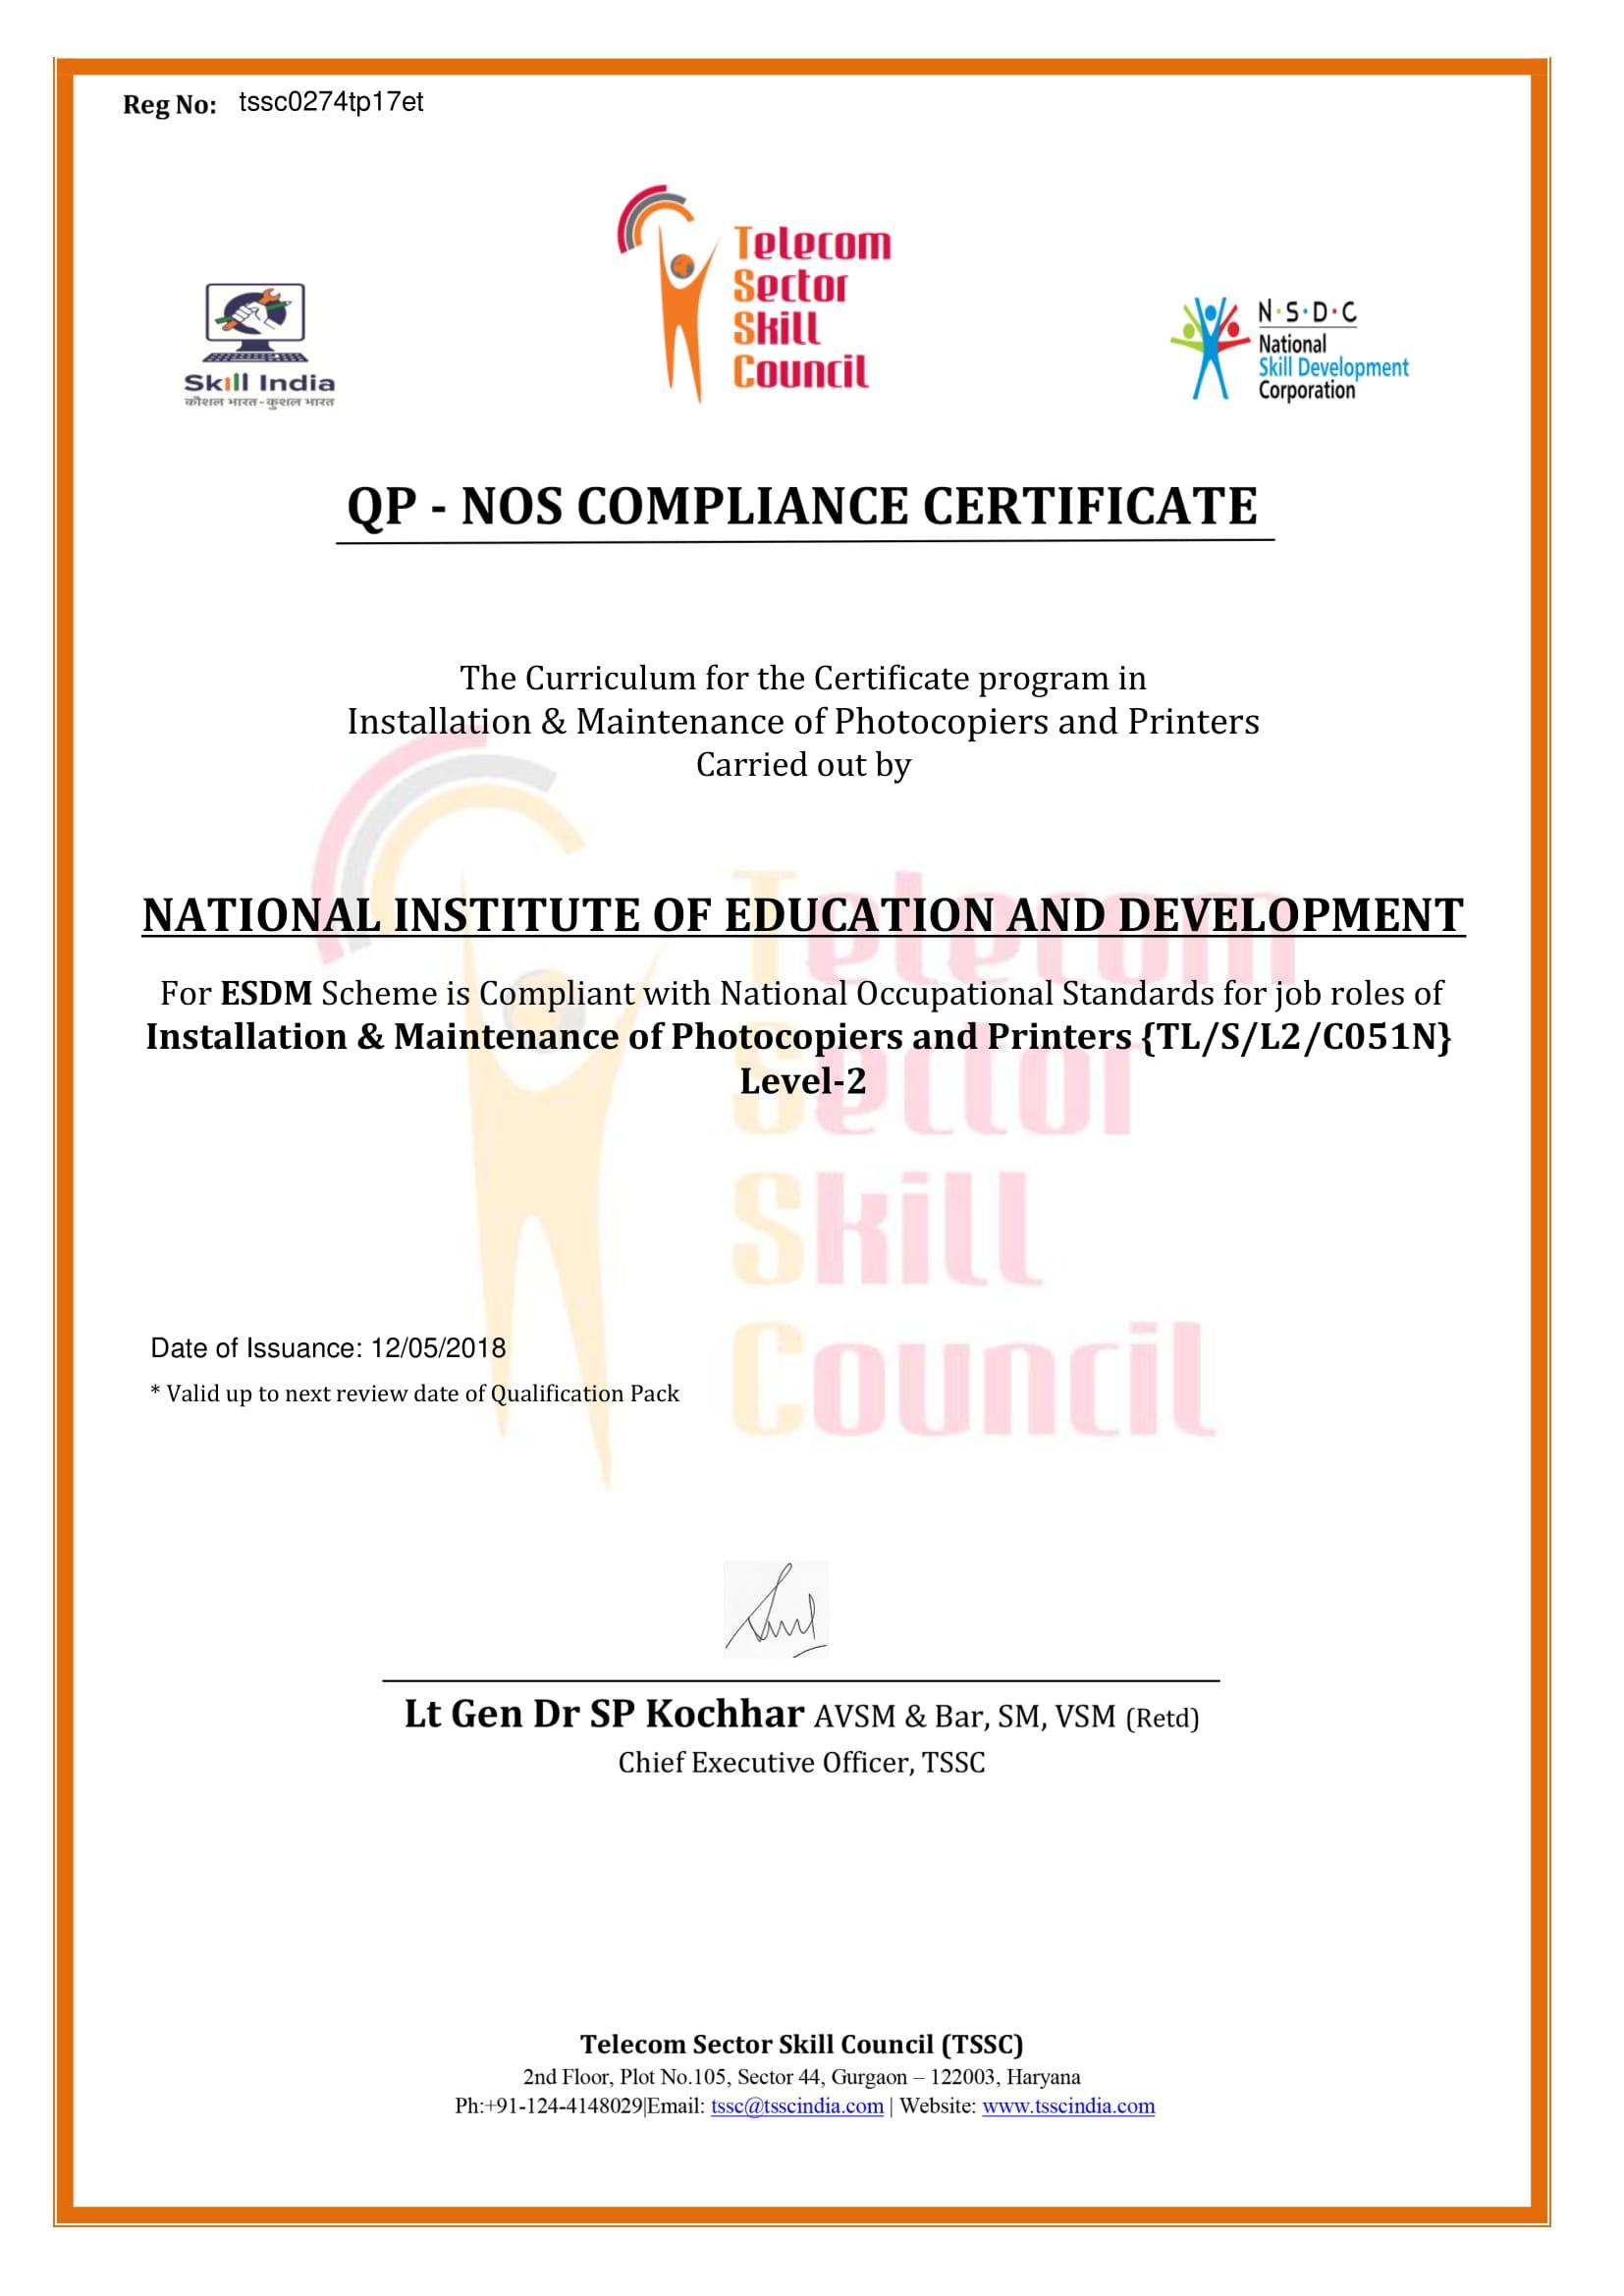 TSSC Certificate